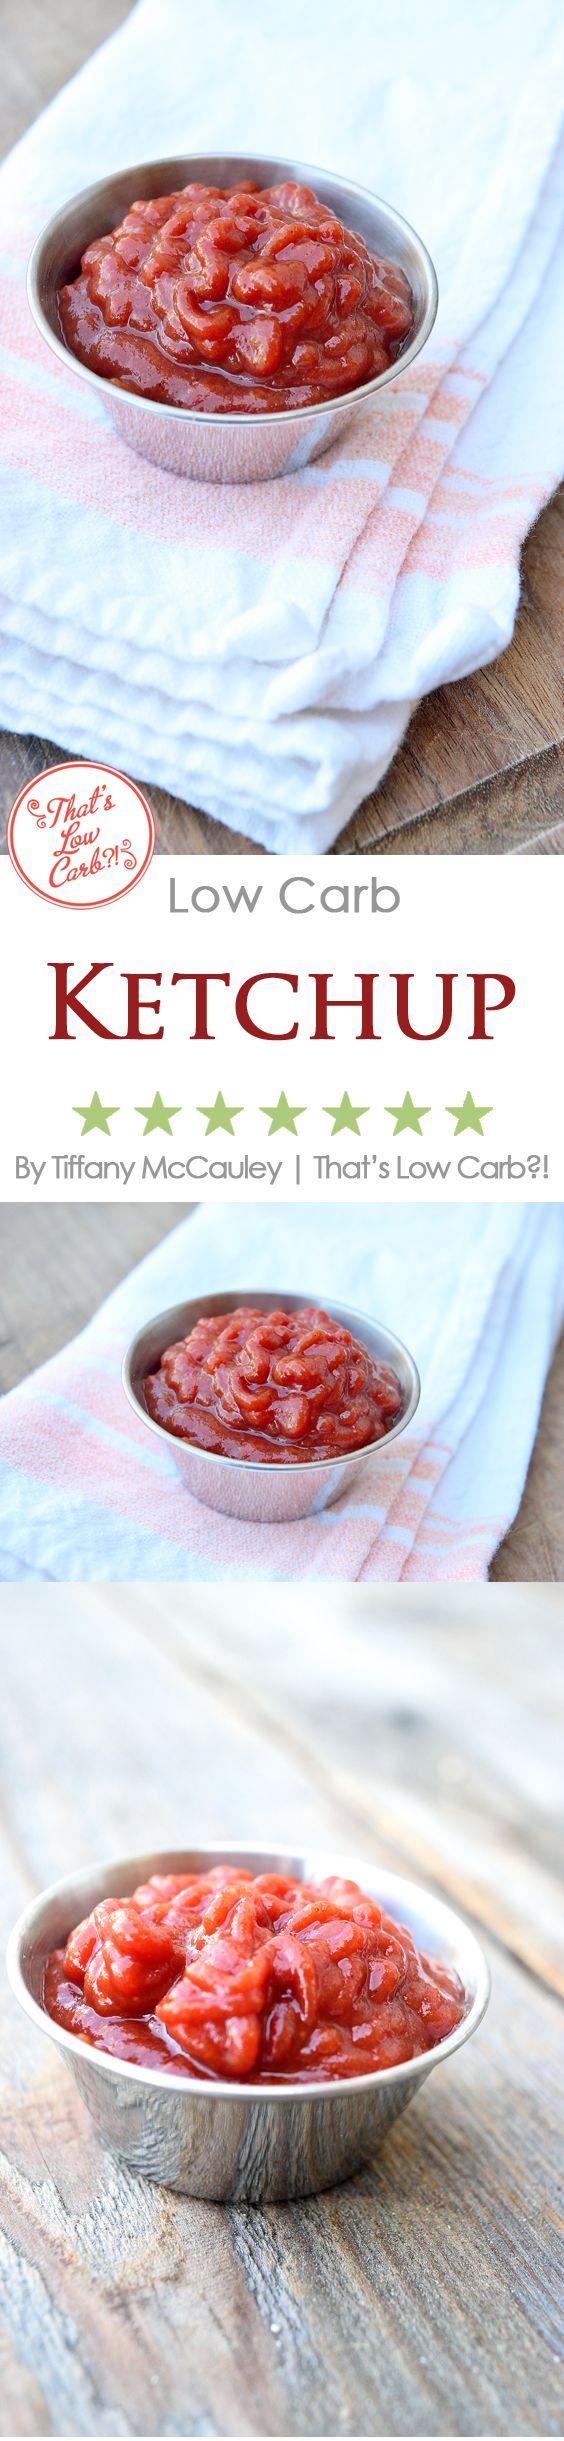 Low Carb Recipes | Low Carb Ketchup Recipe | Ketchup Recipe | Low Carb ~ https://www.thatslowcarb.com